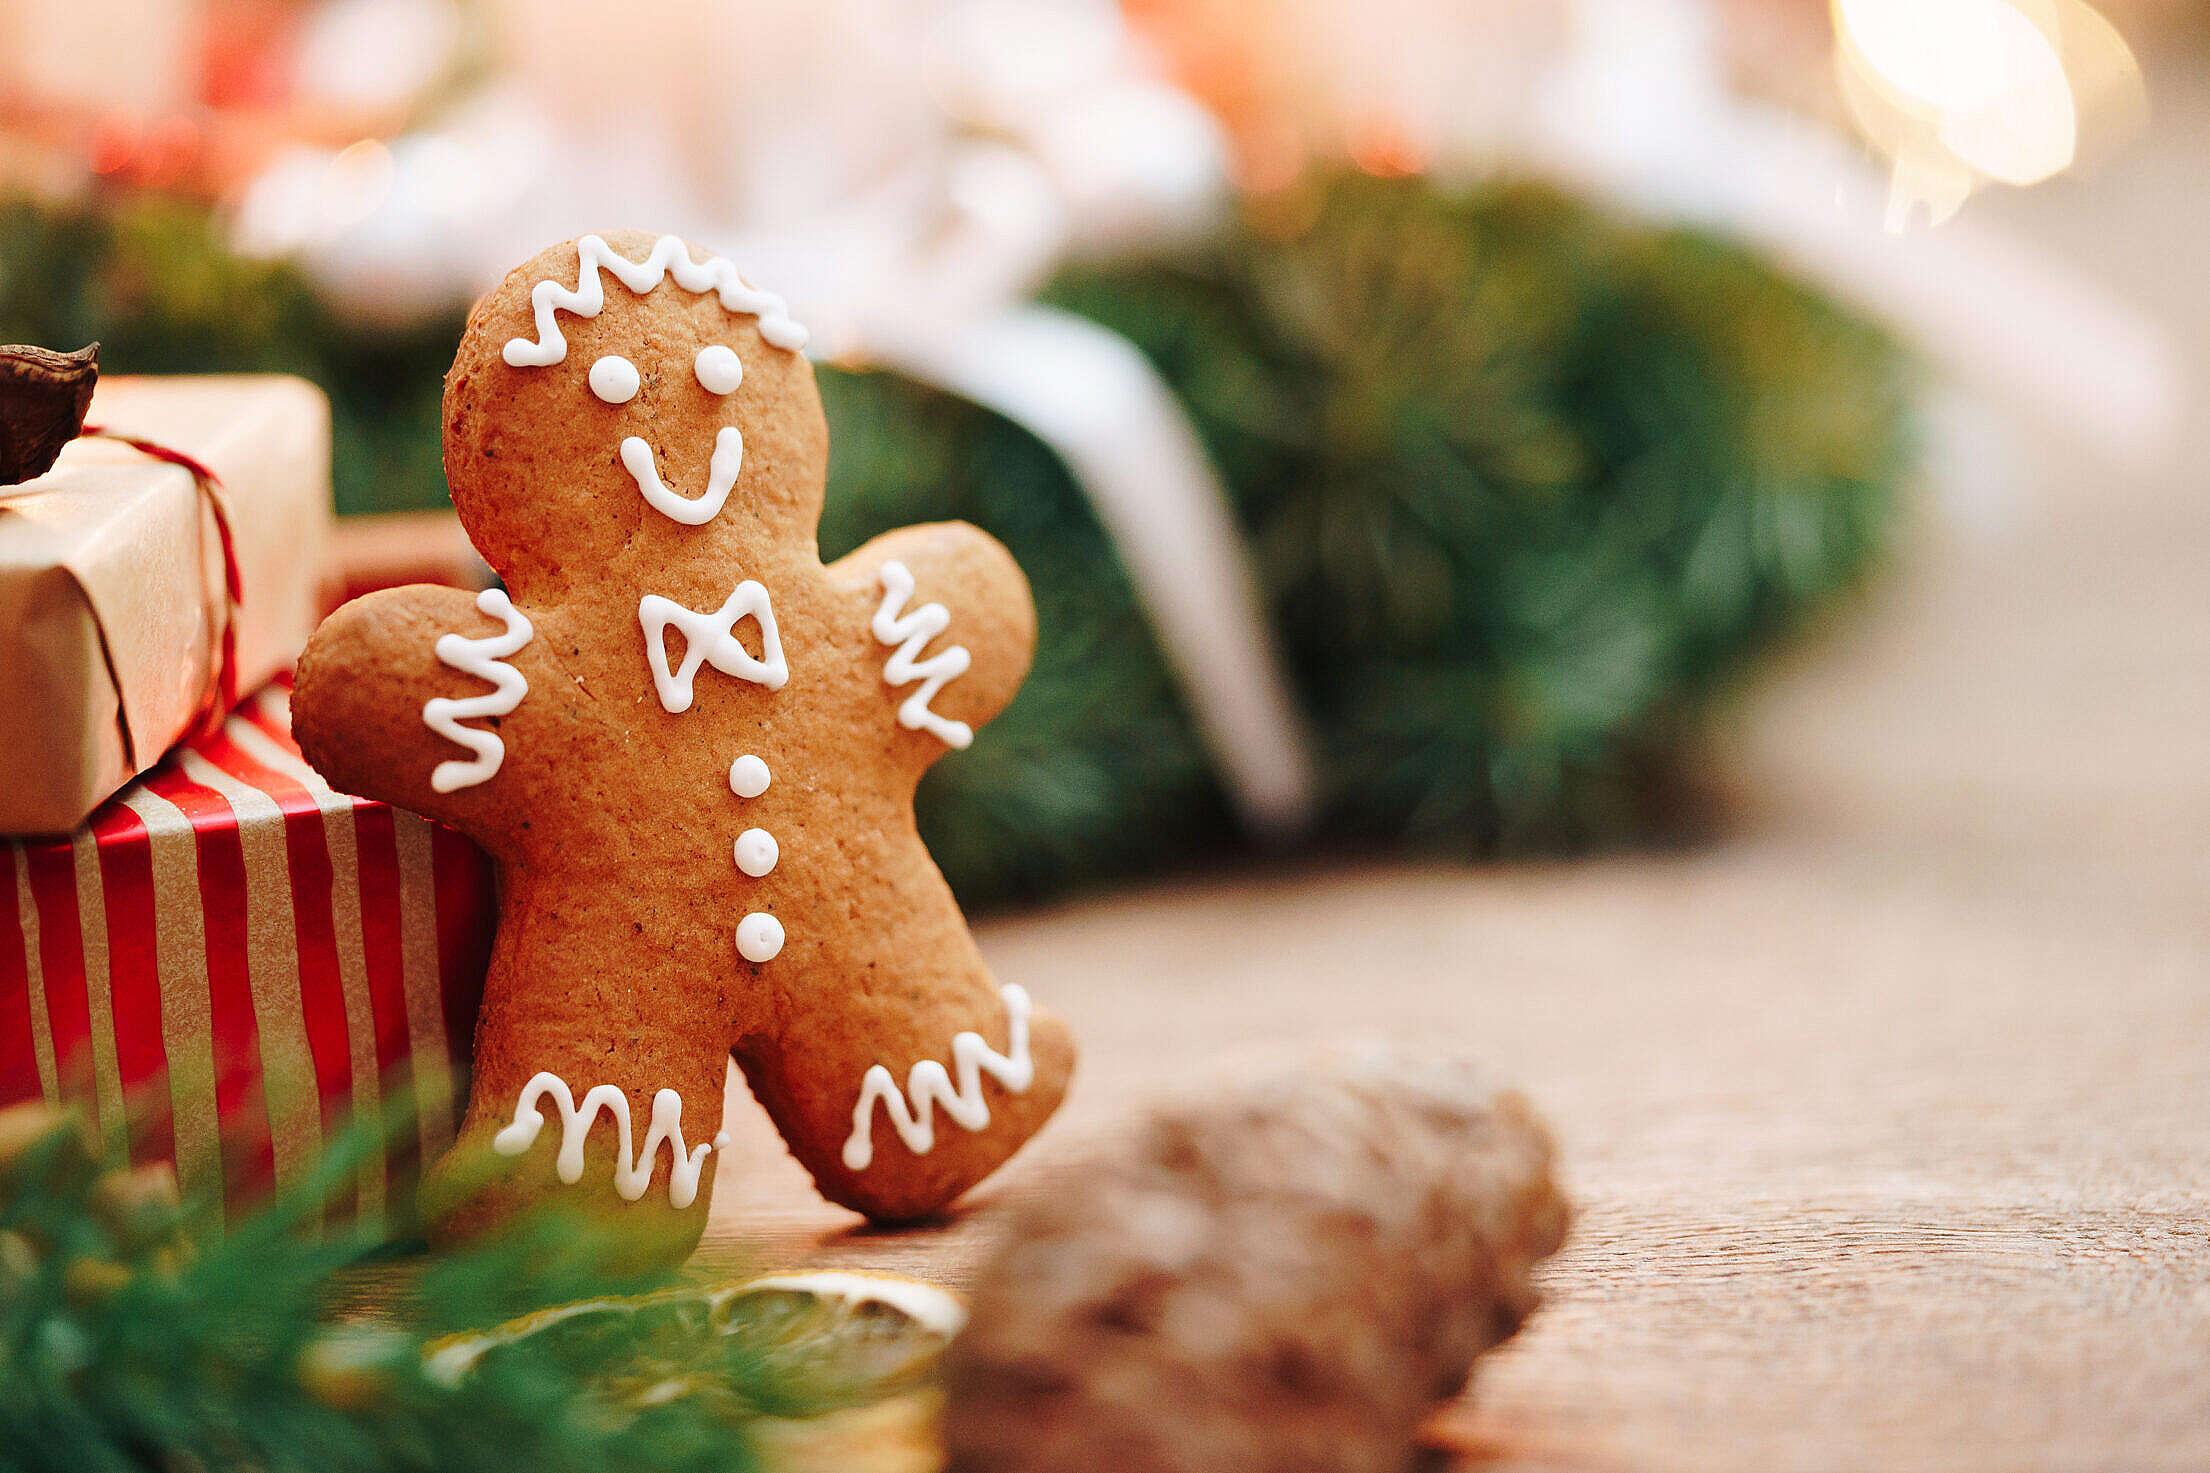 Christmas Gingerbread Man Free Stock Photo